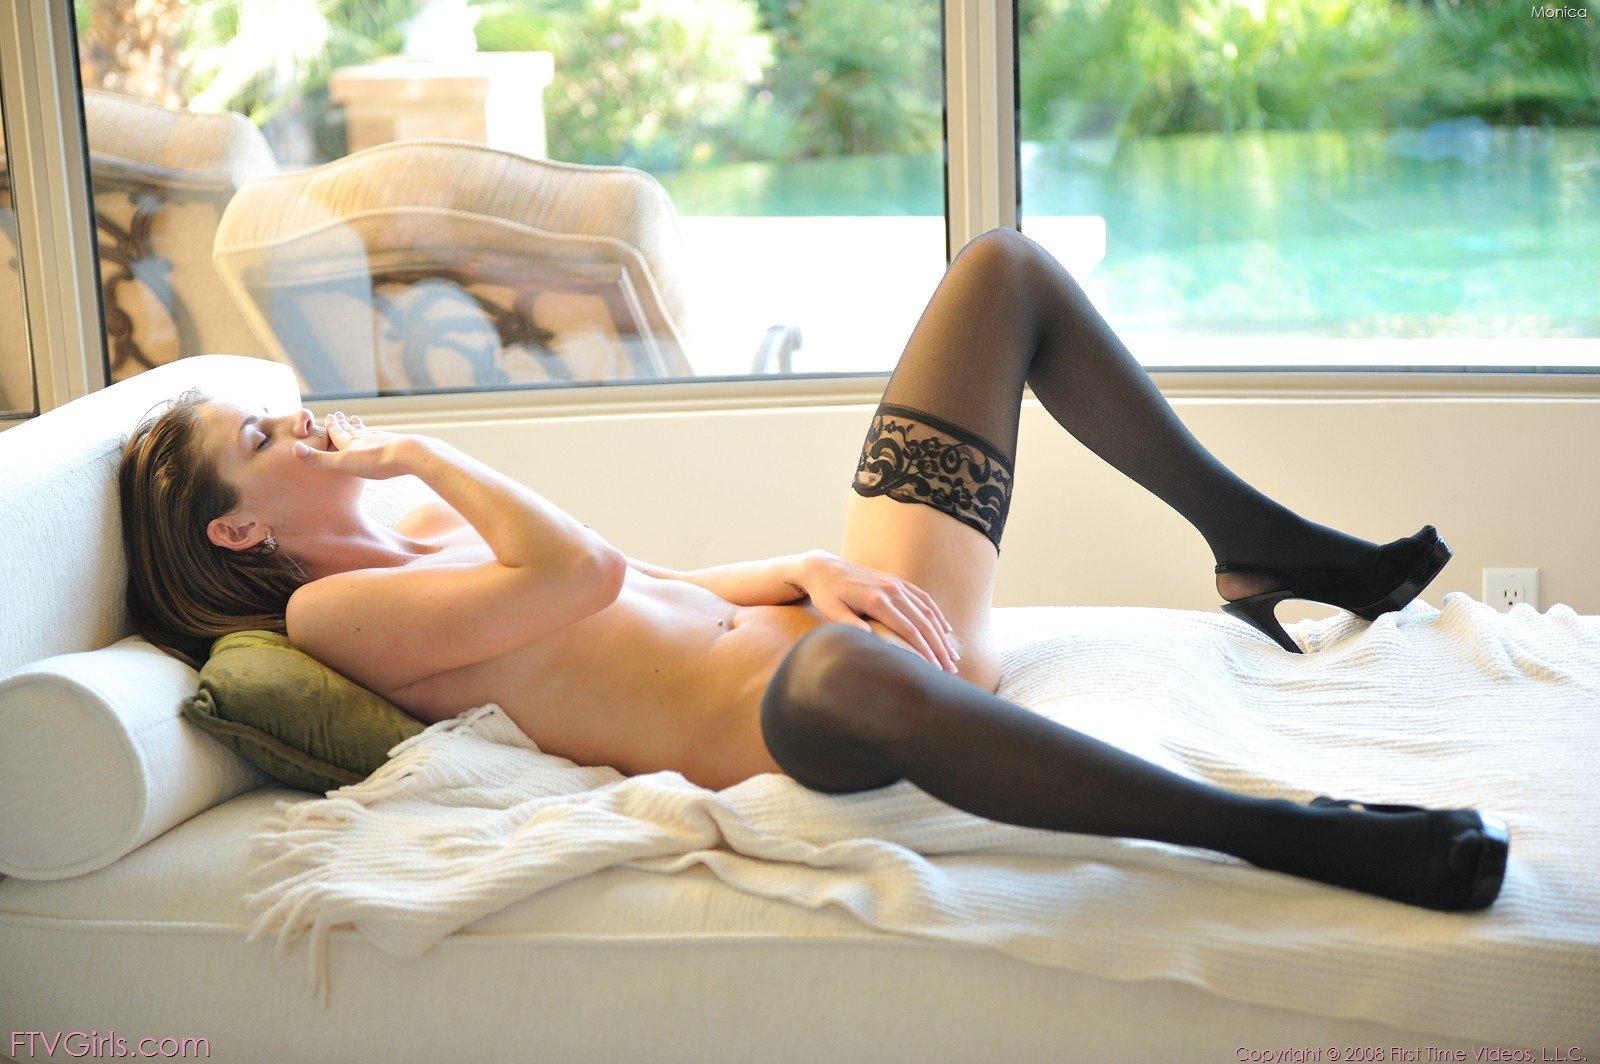 Ftv girls hardcore anal nude xxx images hq